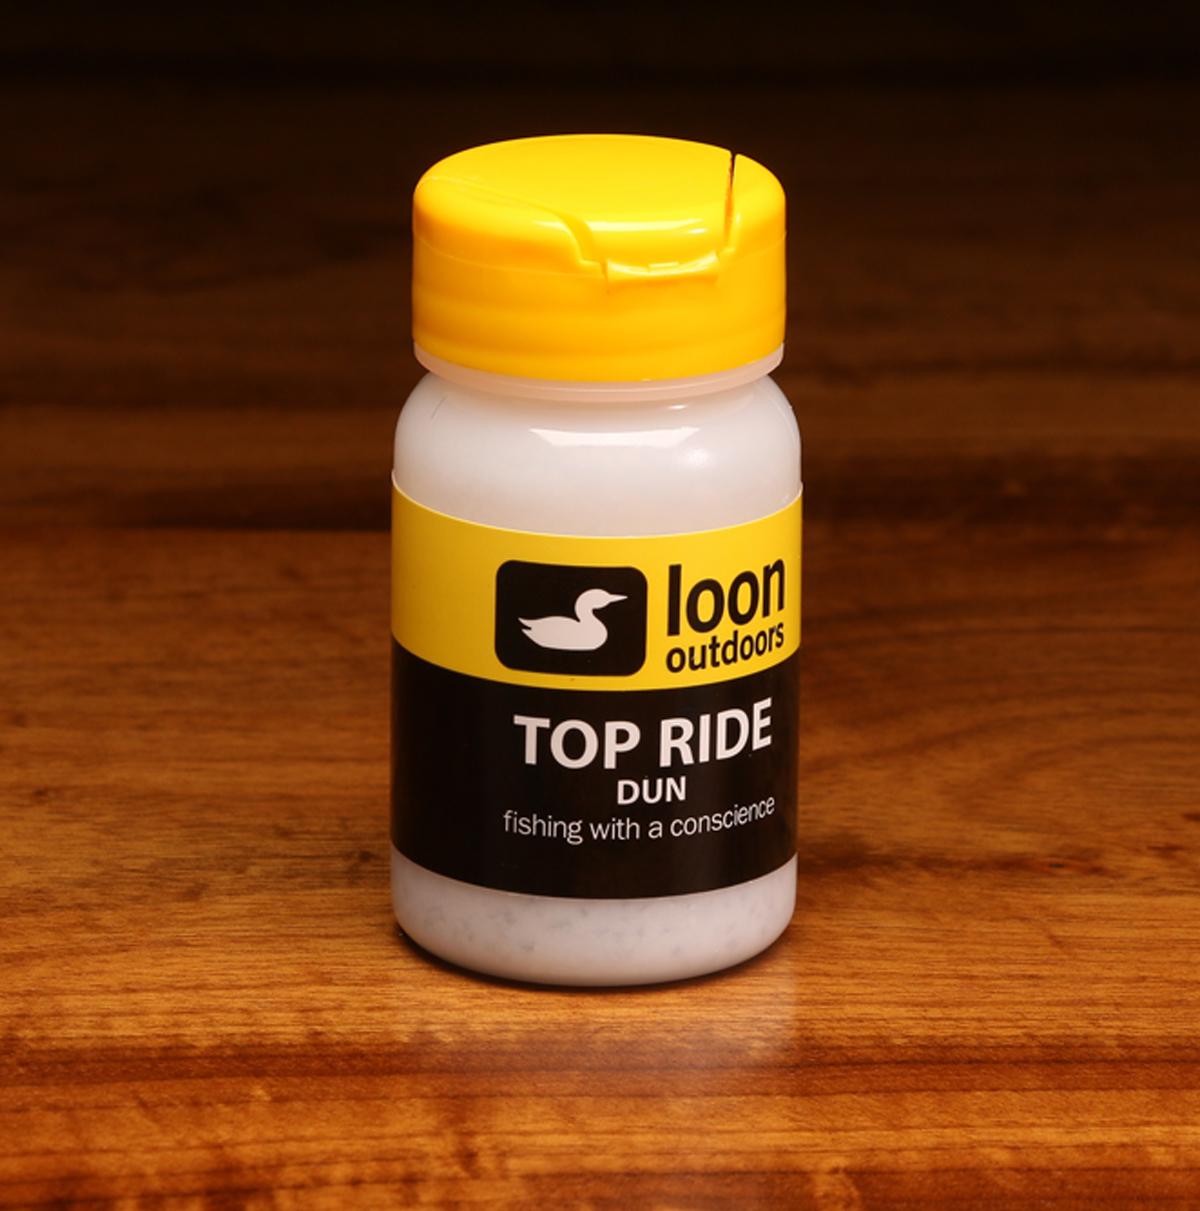 Loon Top Ride Dun